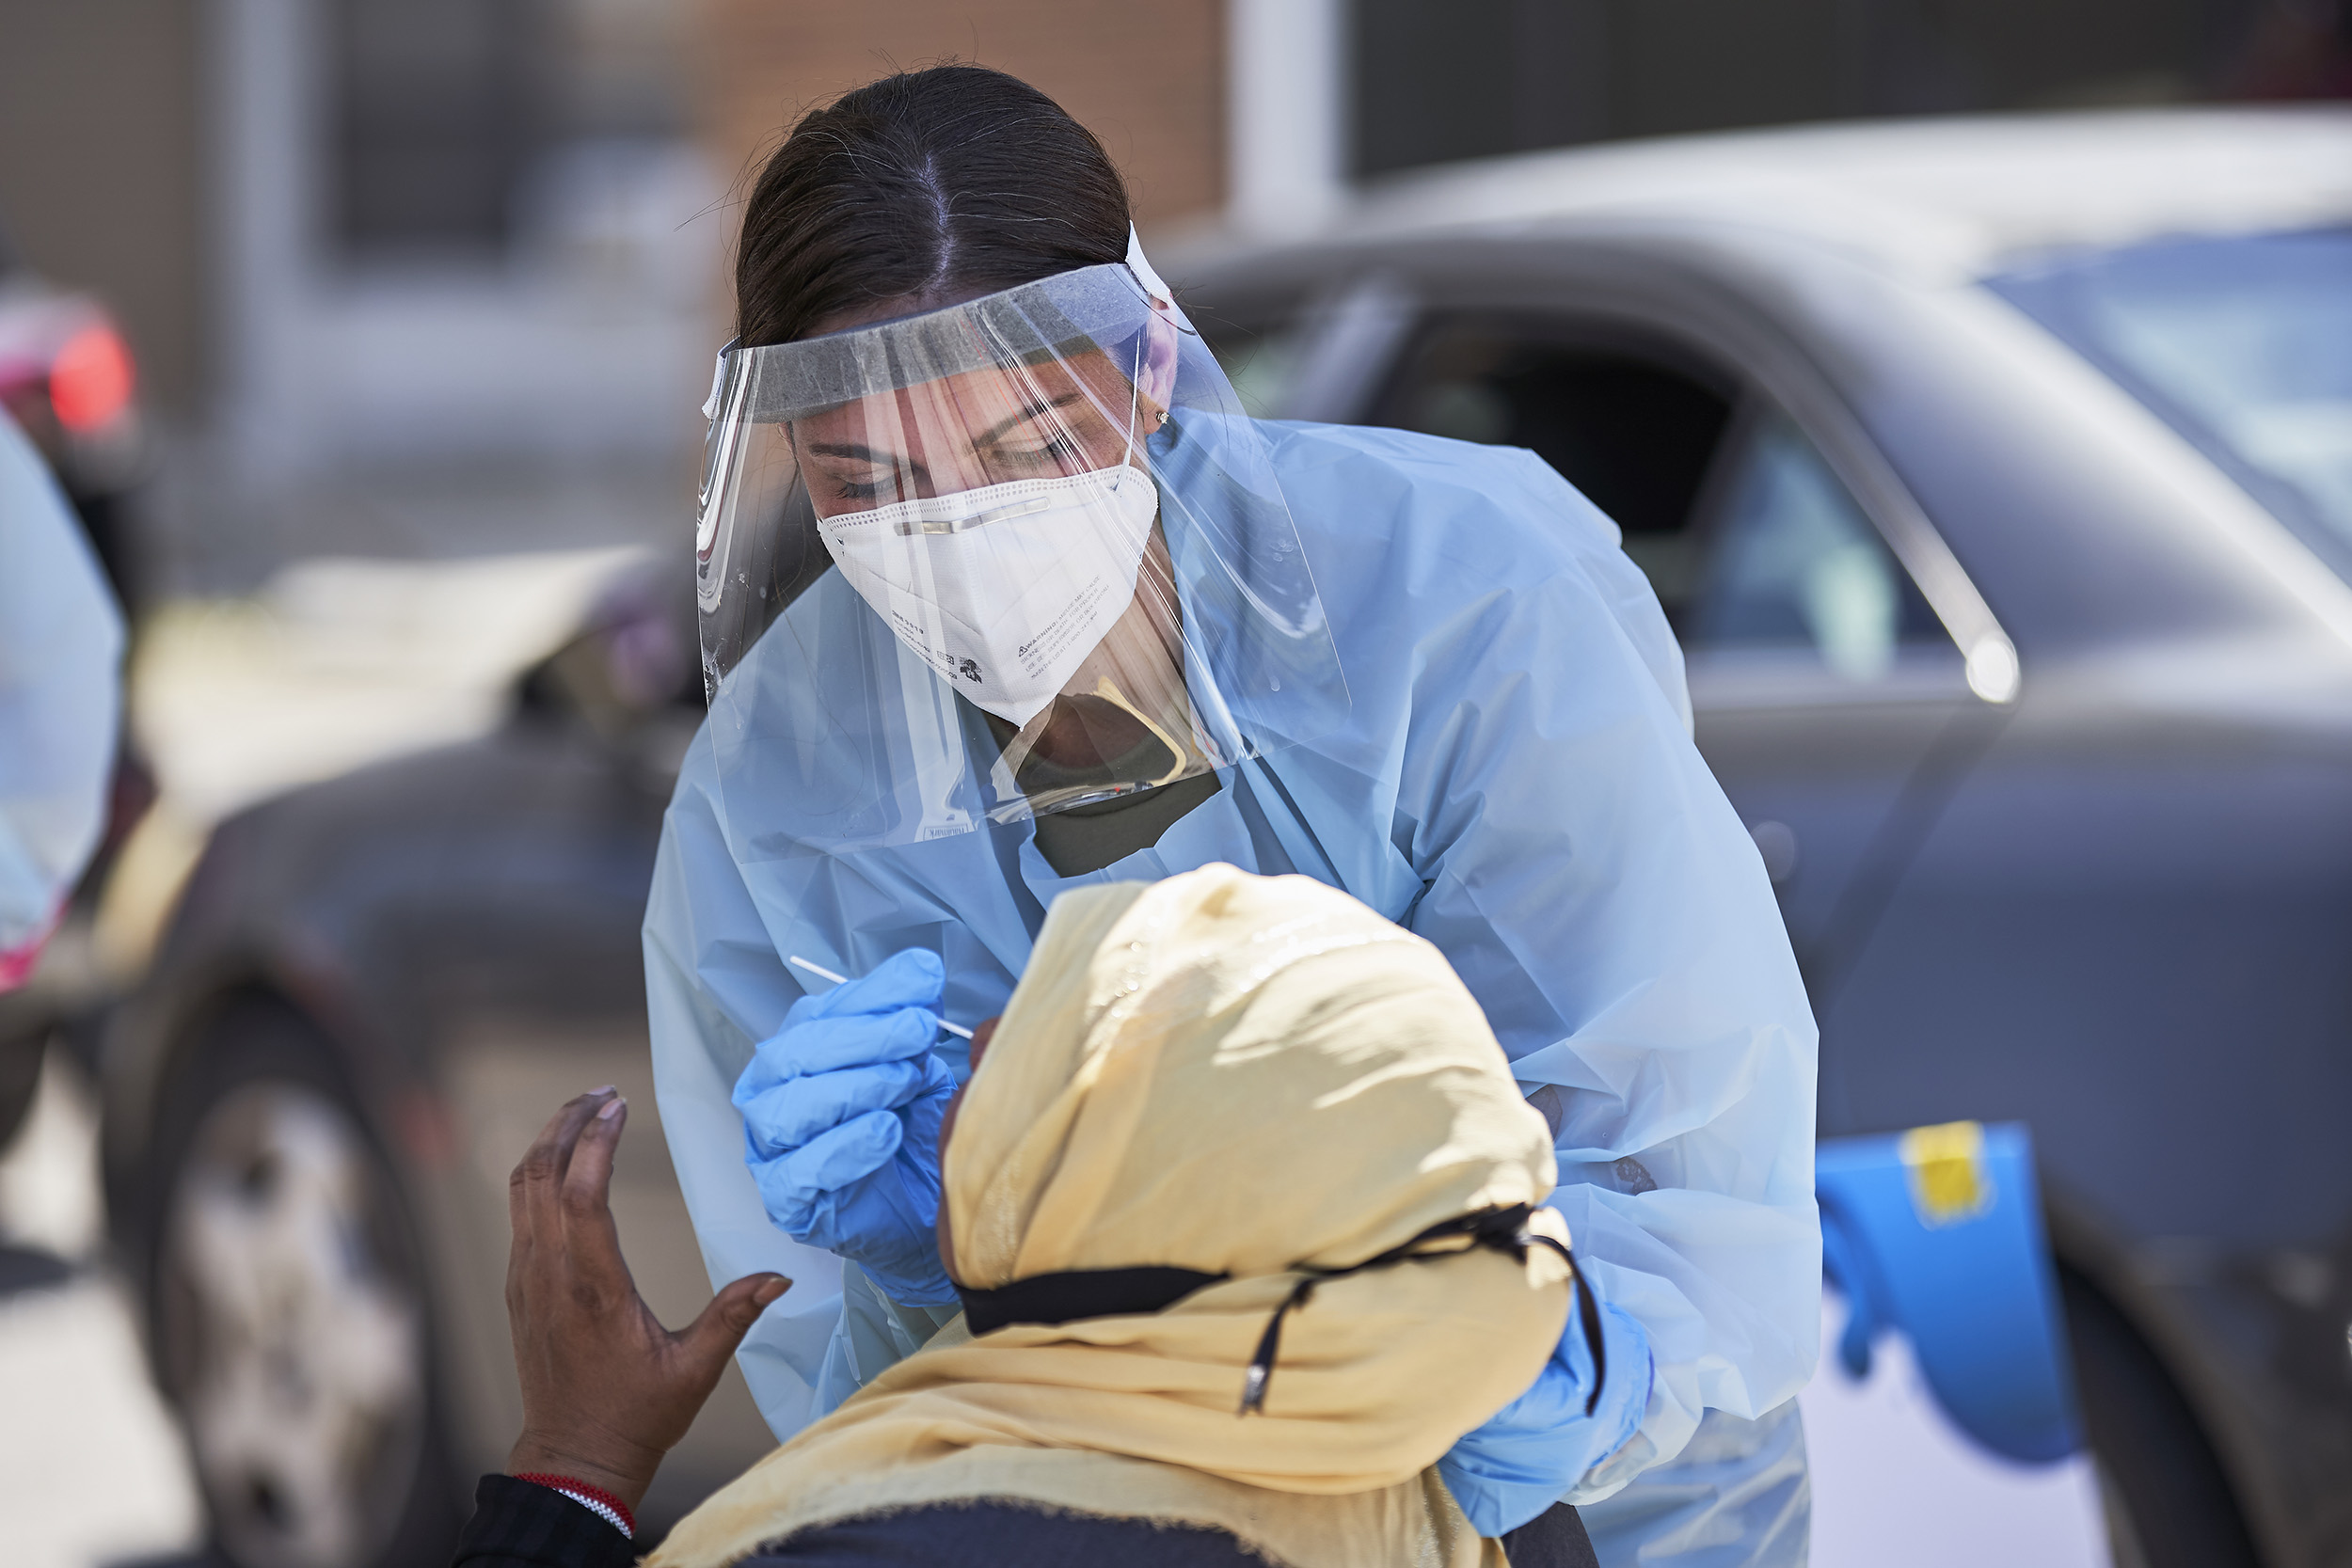 A nurse administers a coronavirus test in Omaha, Nebraska, on July 10.